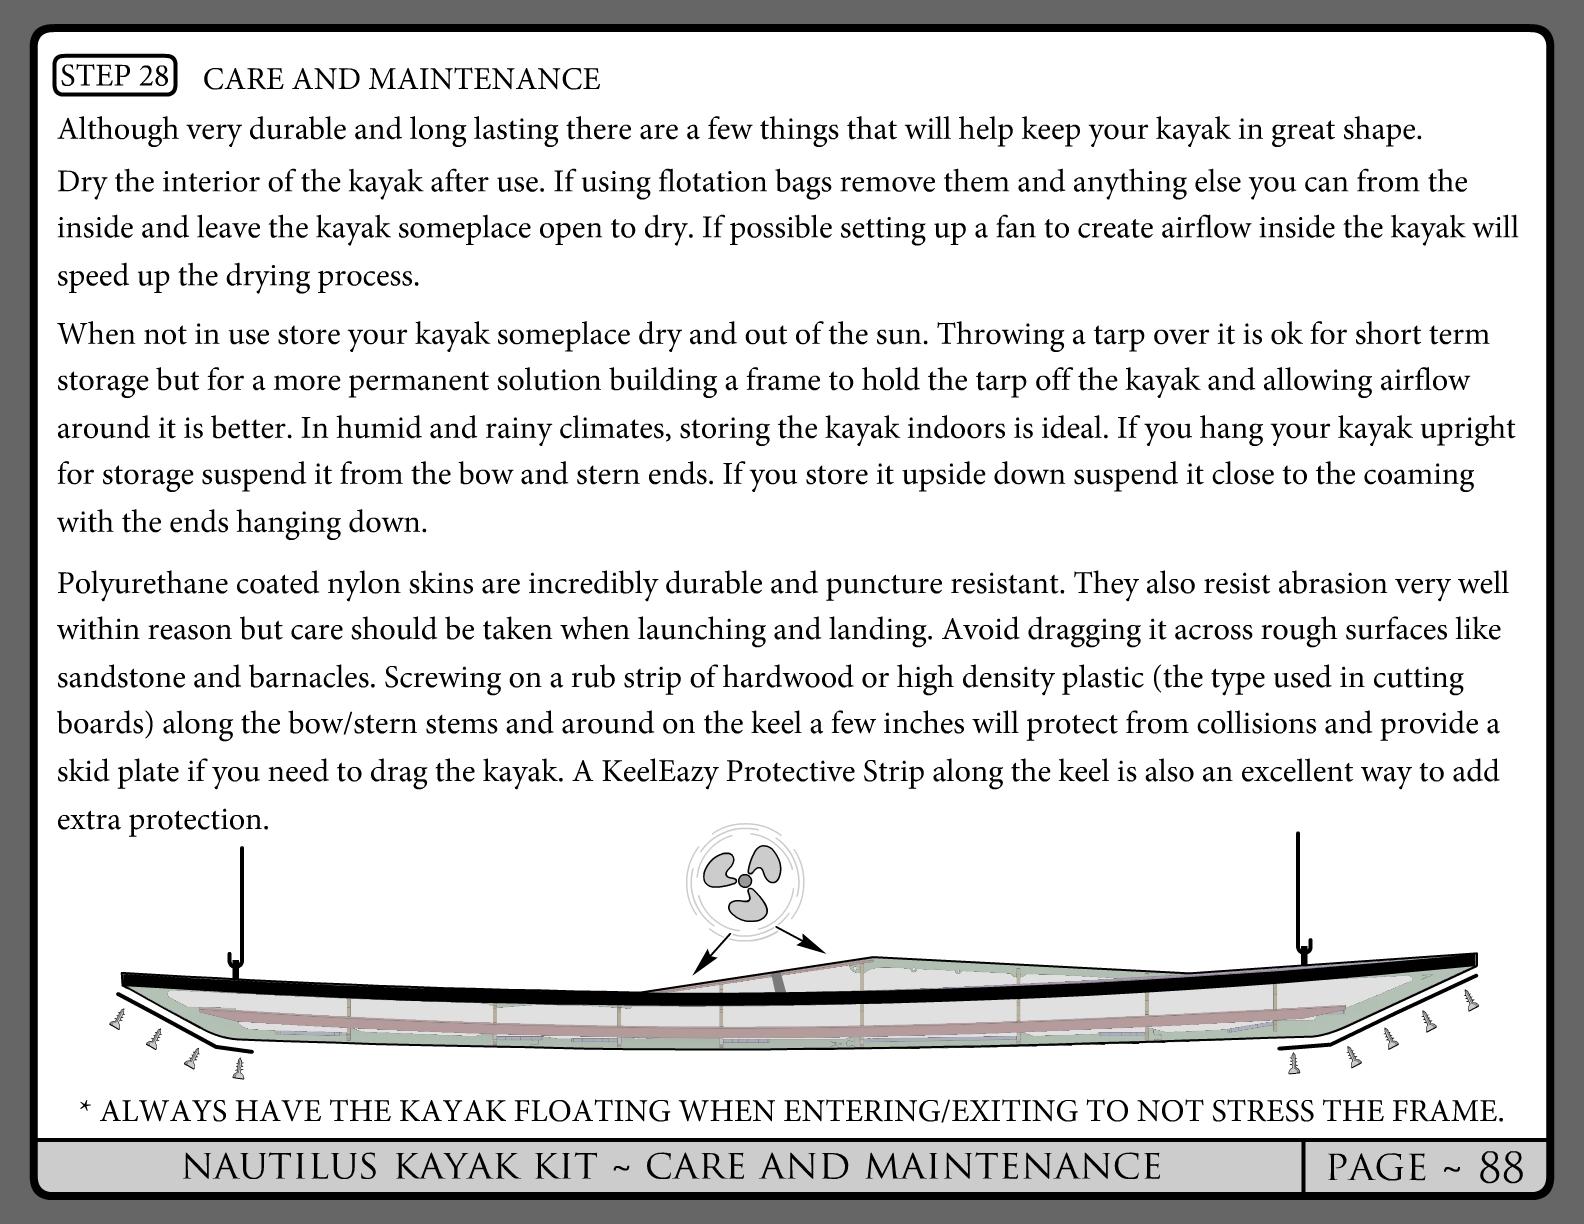 Nautilus Instructions_0091.jpg